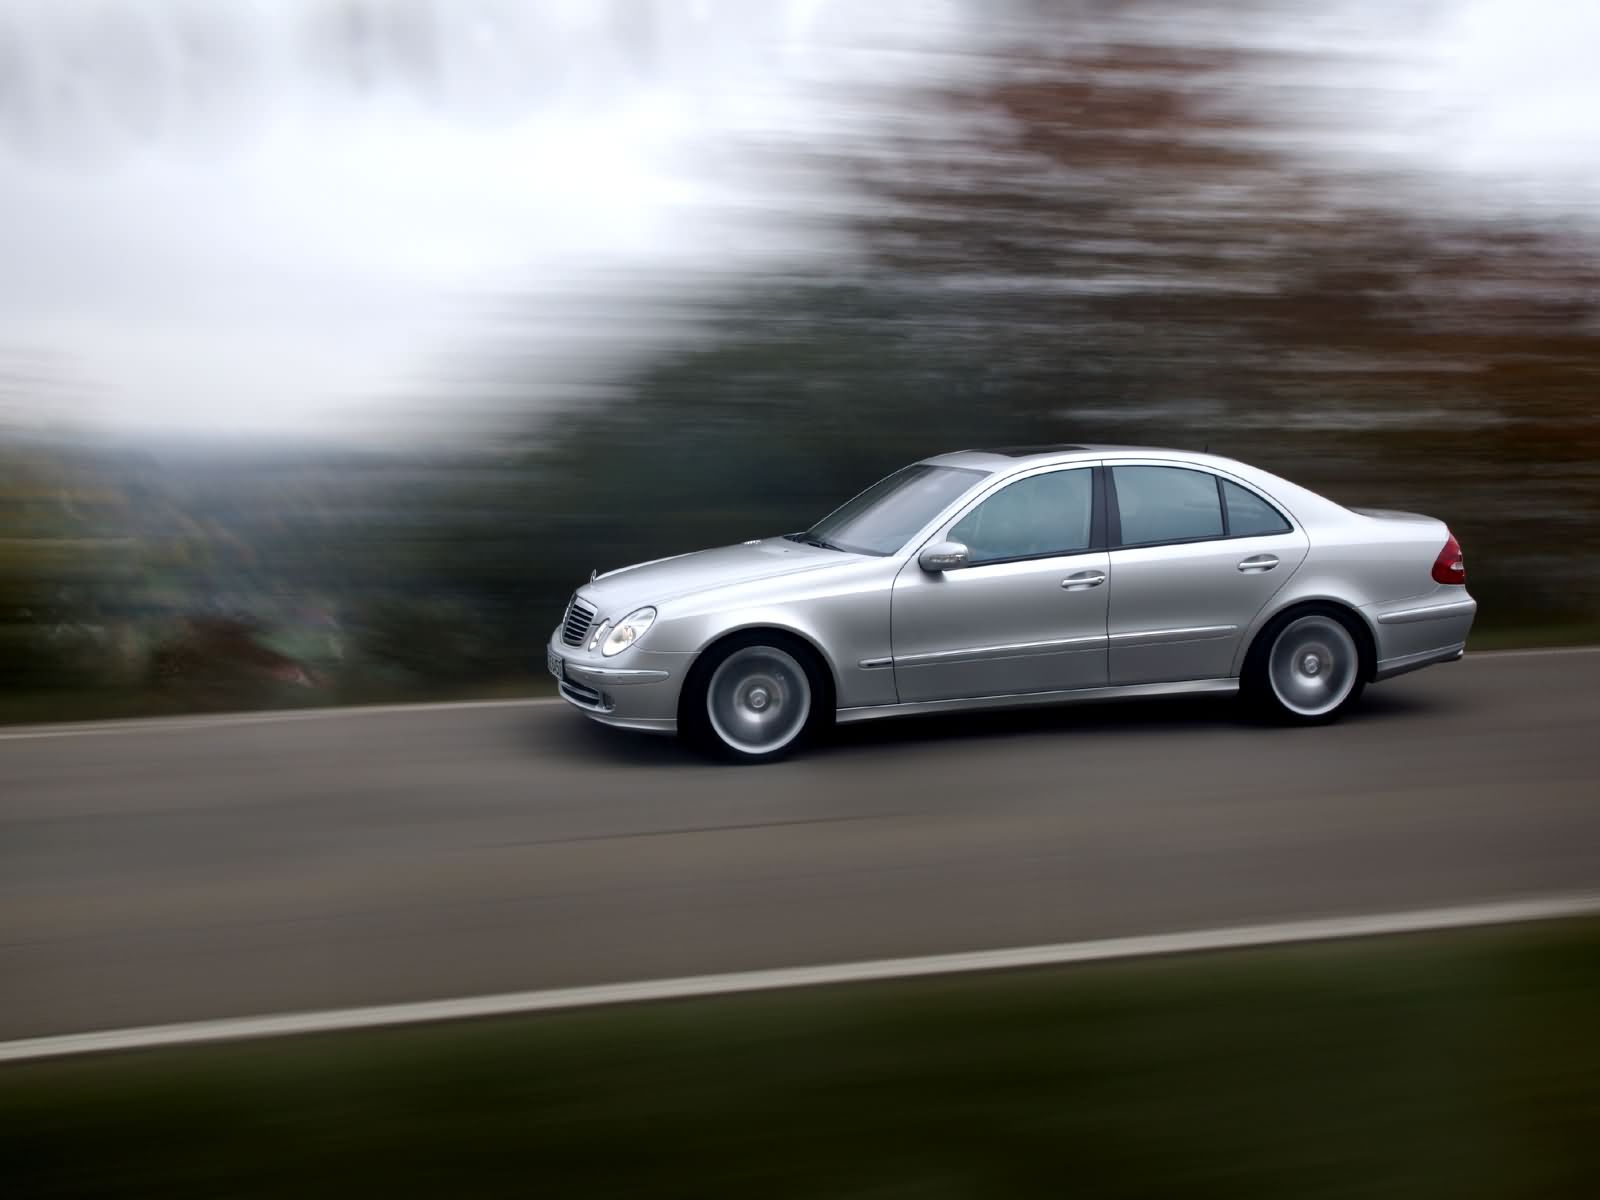 Mercedes benz e class w211 picture 17108 mercedes benz for Mercedes benz video